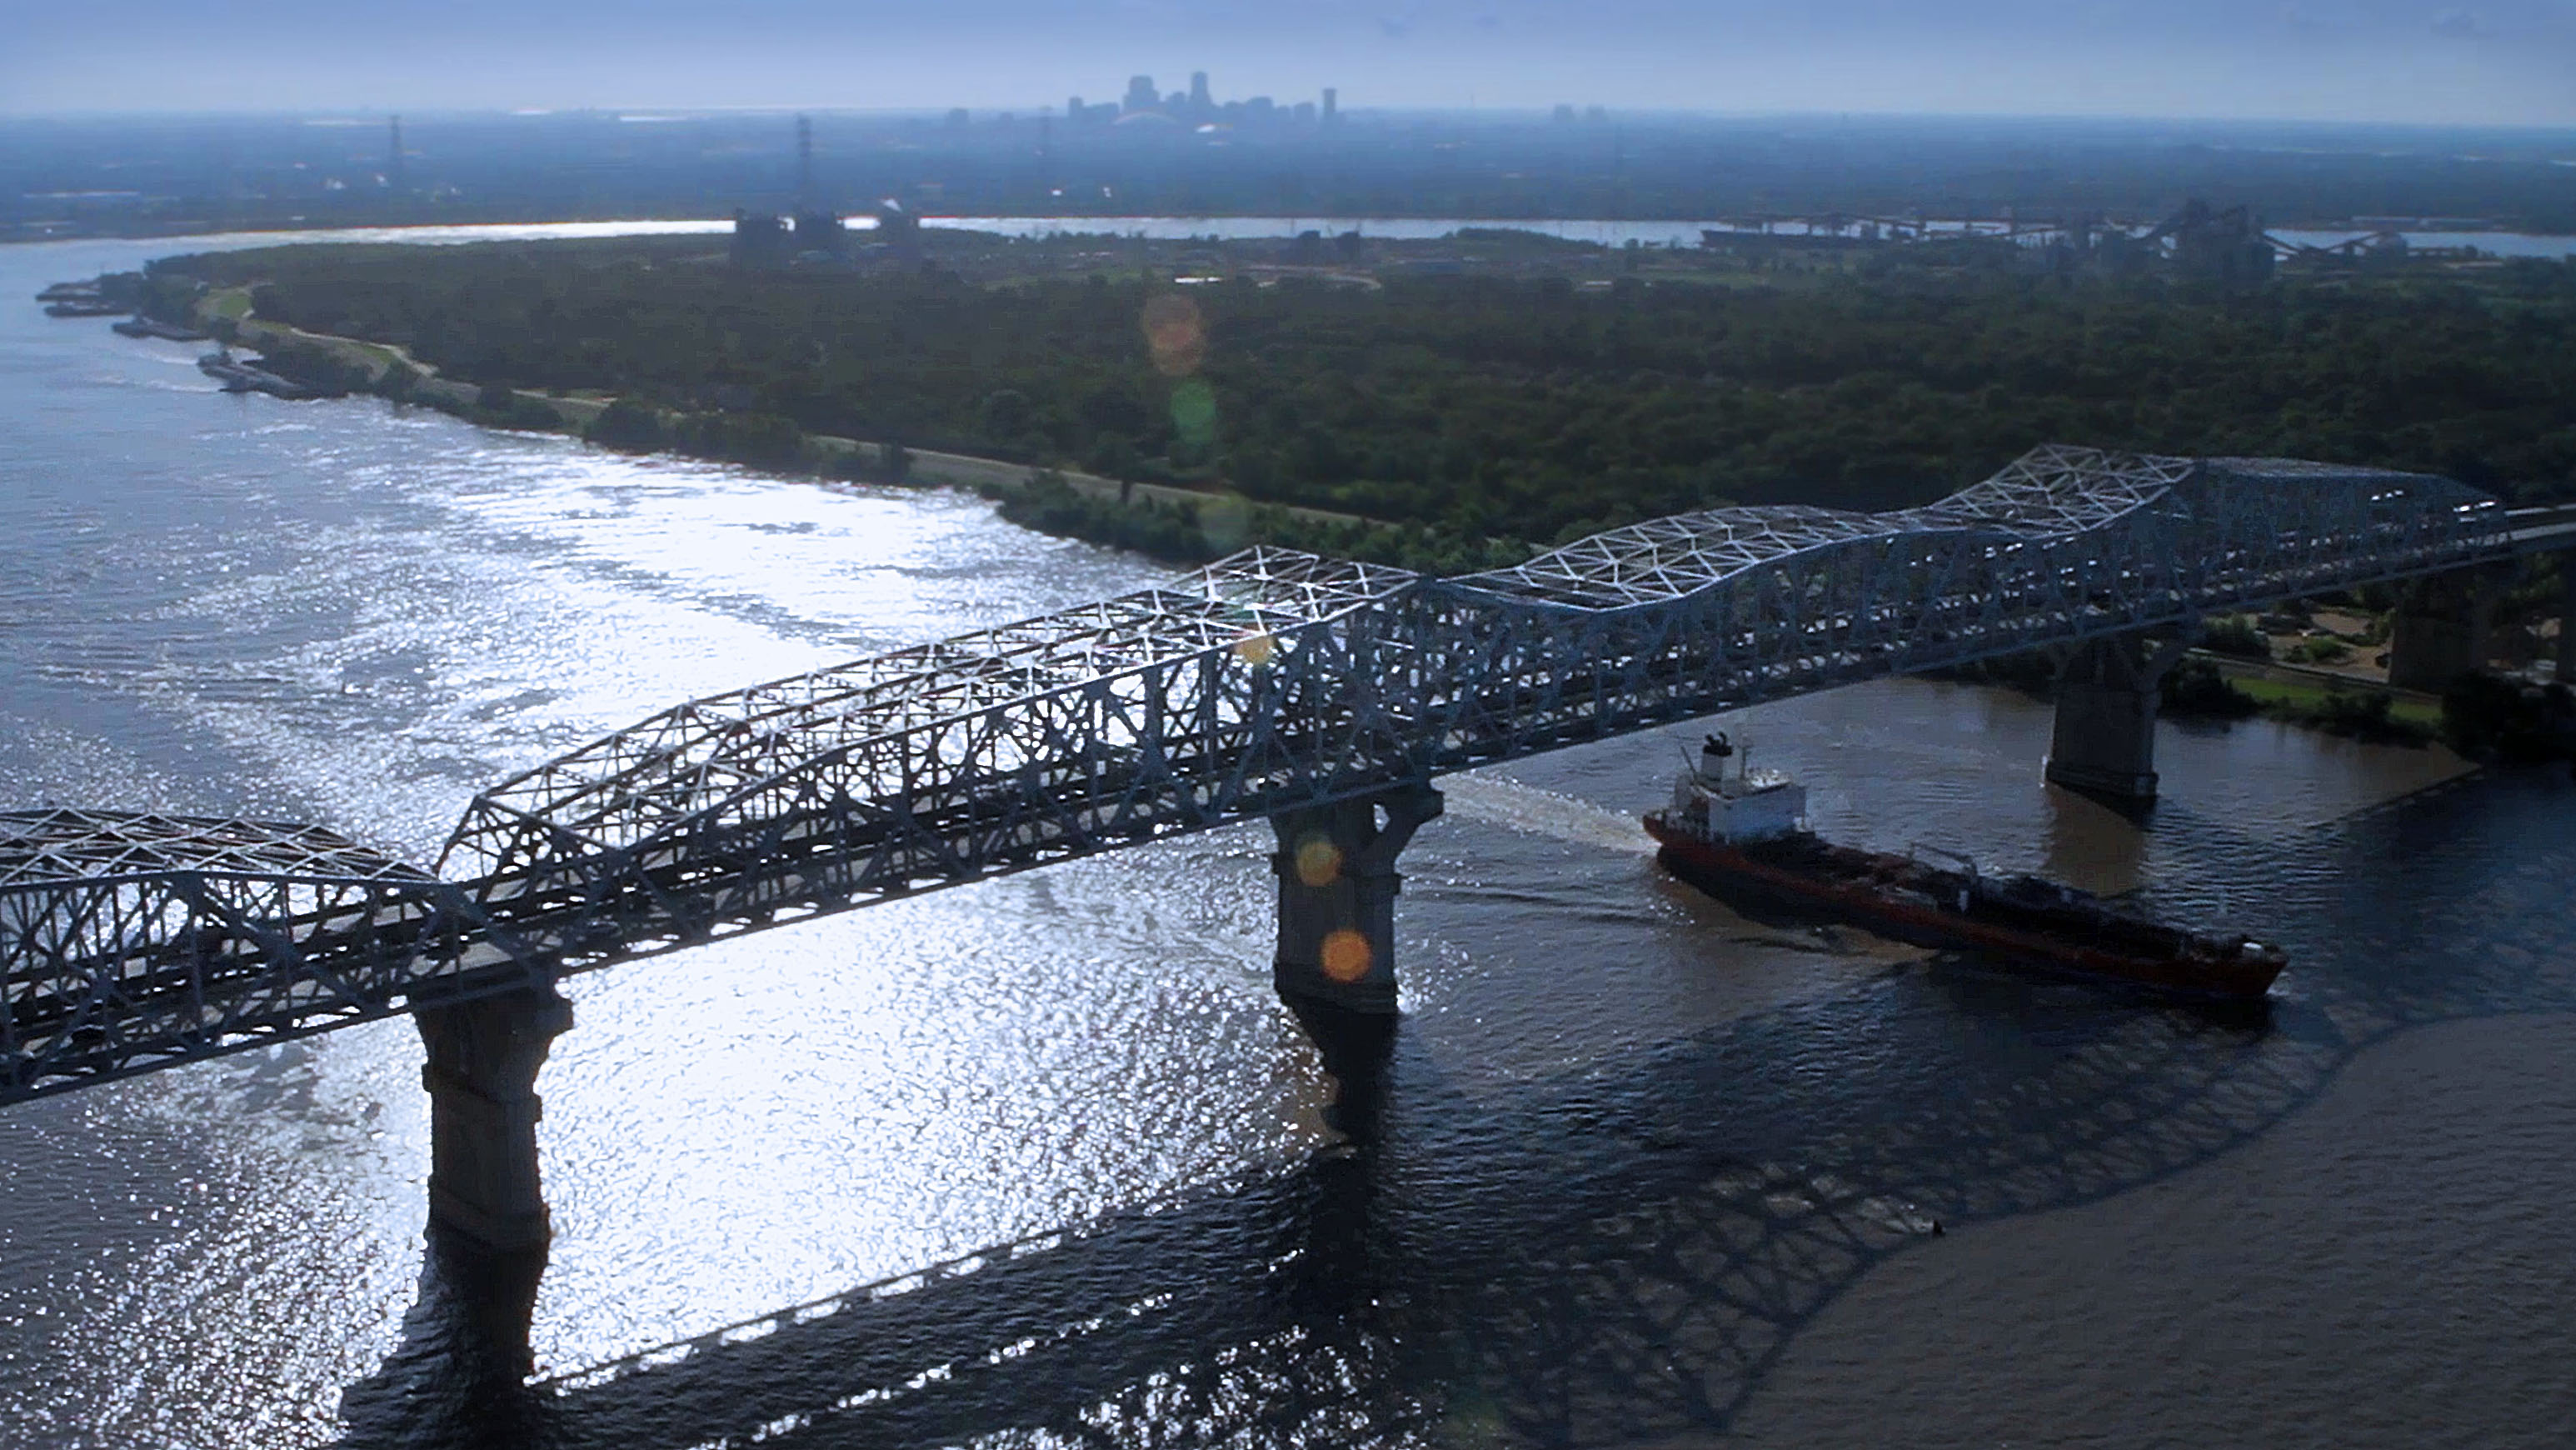 Hue P. Long Bridge New Orleans